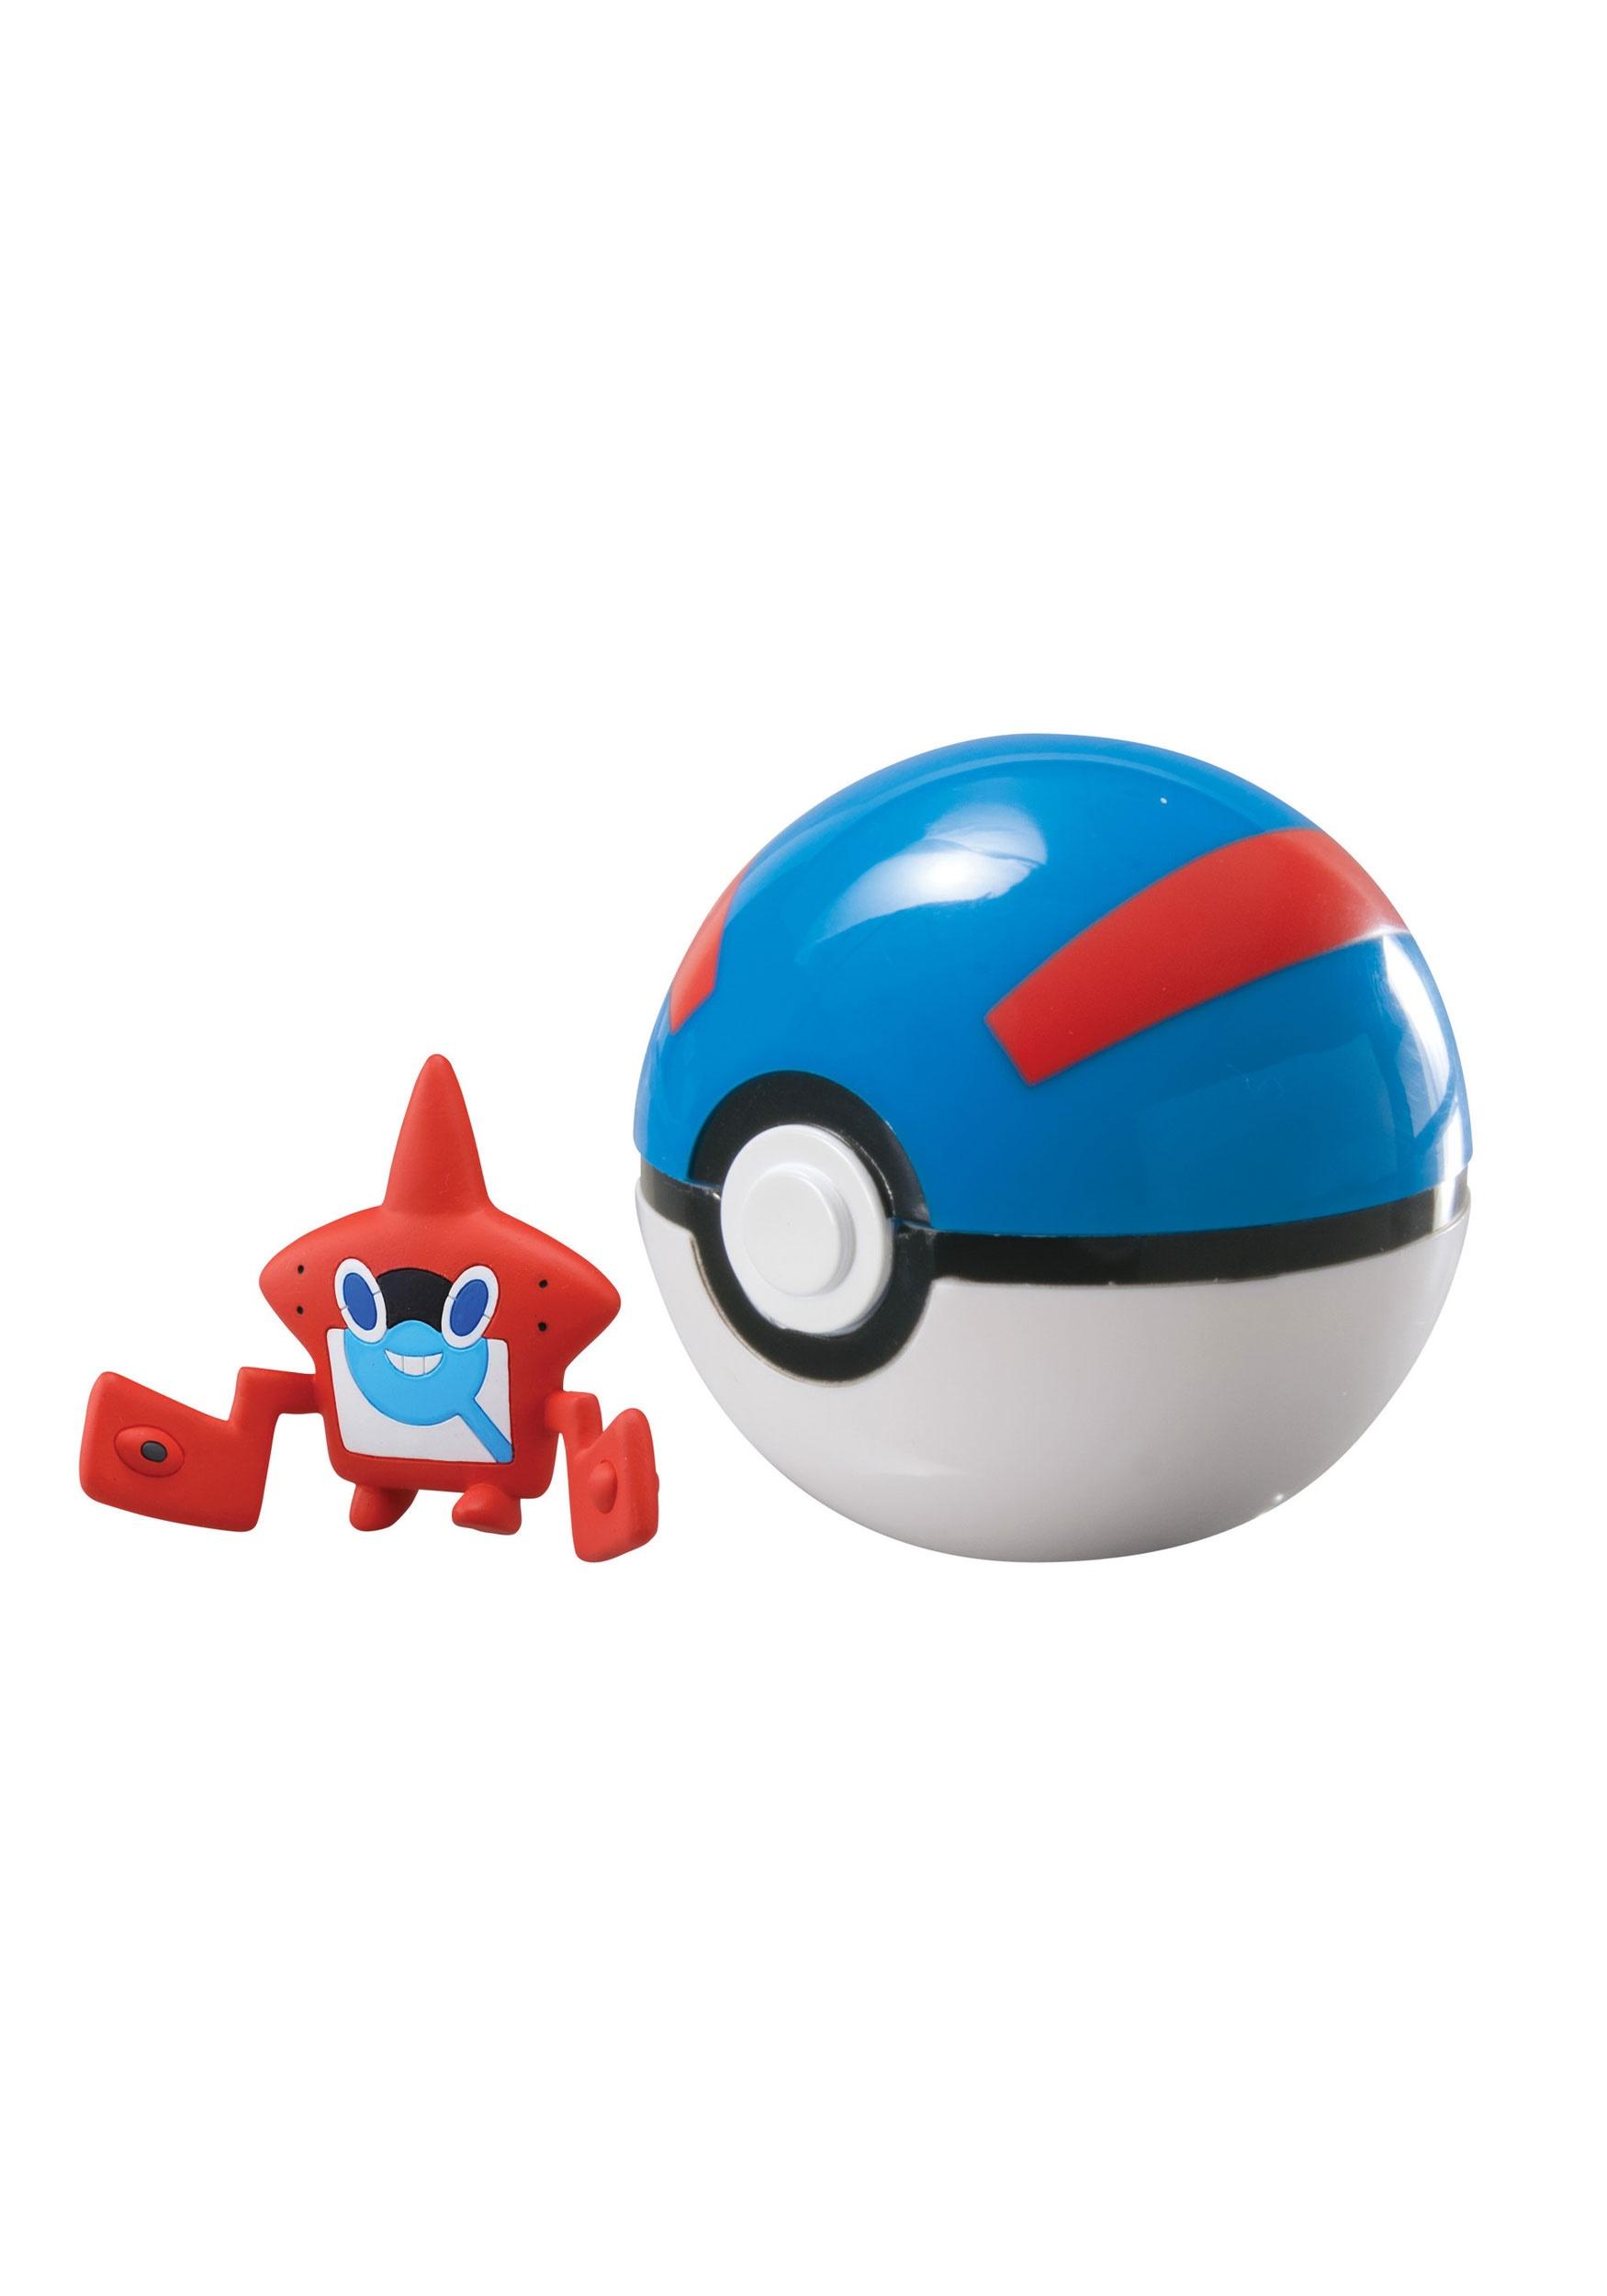 Rotom Pokedex Great Ball Set From Pokemon